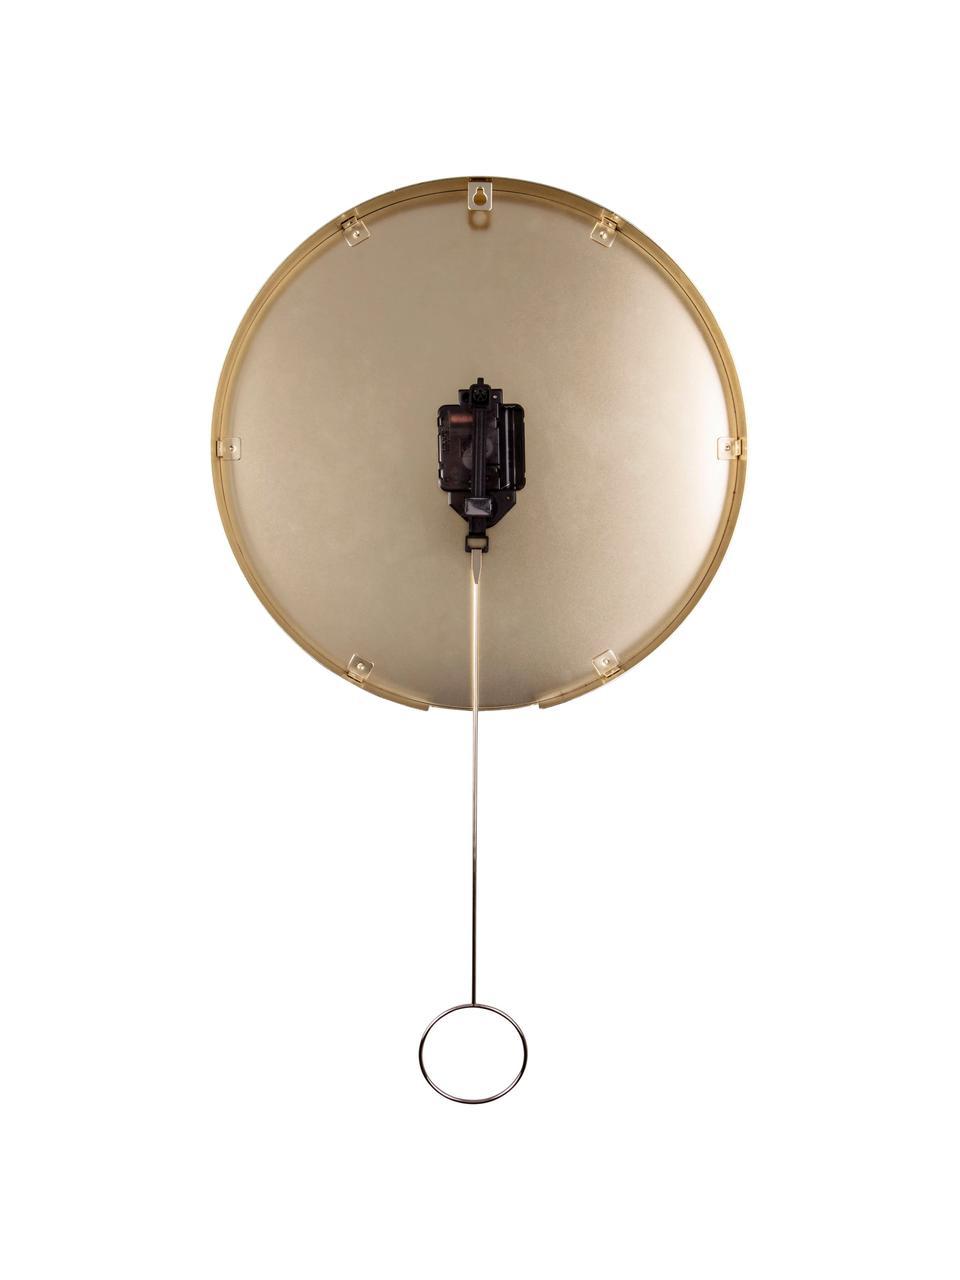 Reloj de pared Doutzen, Metal recubierto, Blanco, latón, Ø 34 cm